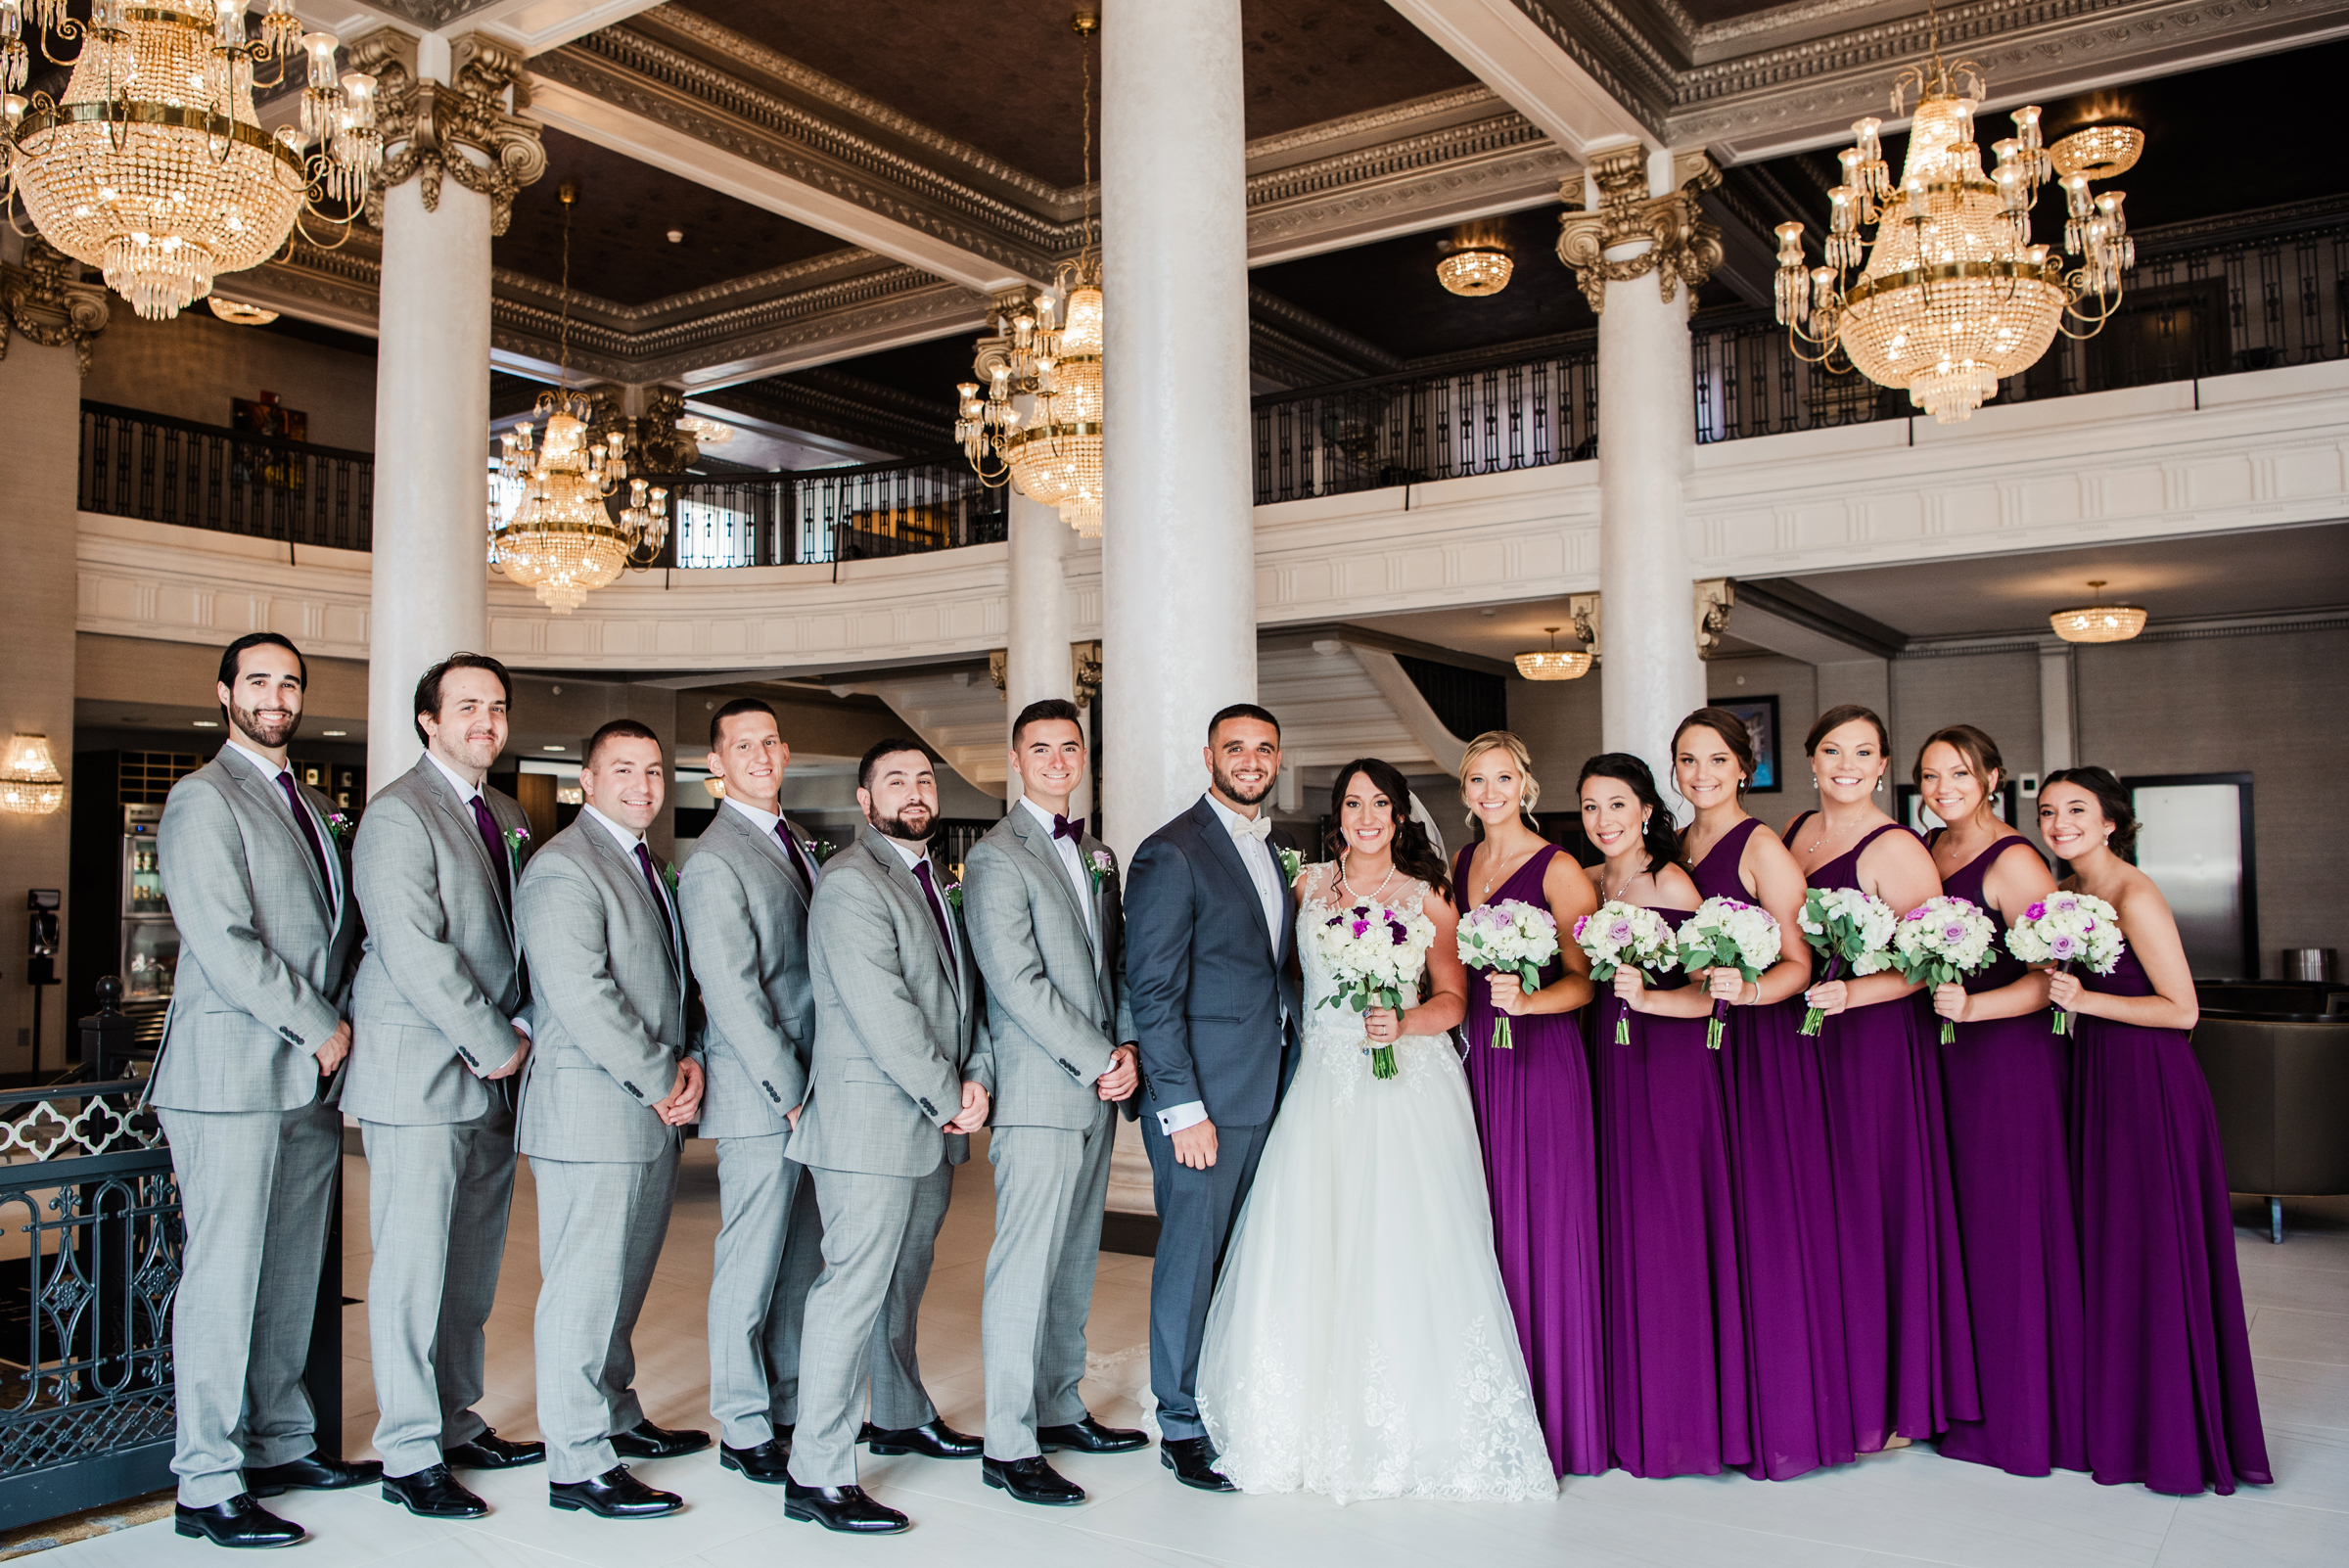 Historic_Old_St_Johns_Church_Valentinos_Banquet_Hall_Central_NY_Wedding_JILL_STUDIO_Rochester_NY_Photographer_DSC_6015.jpg